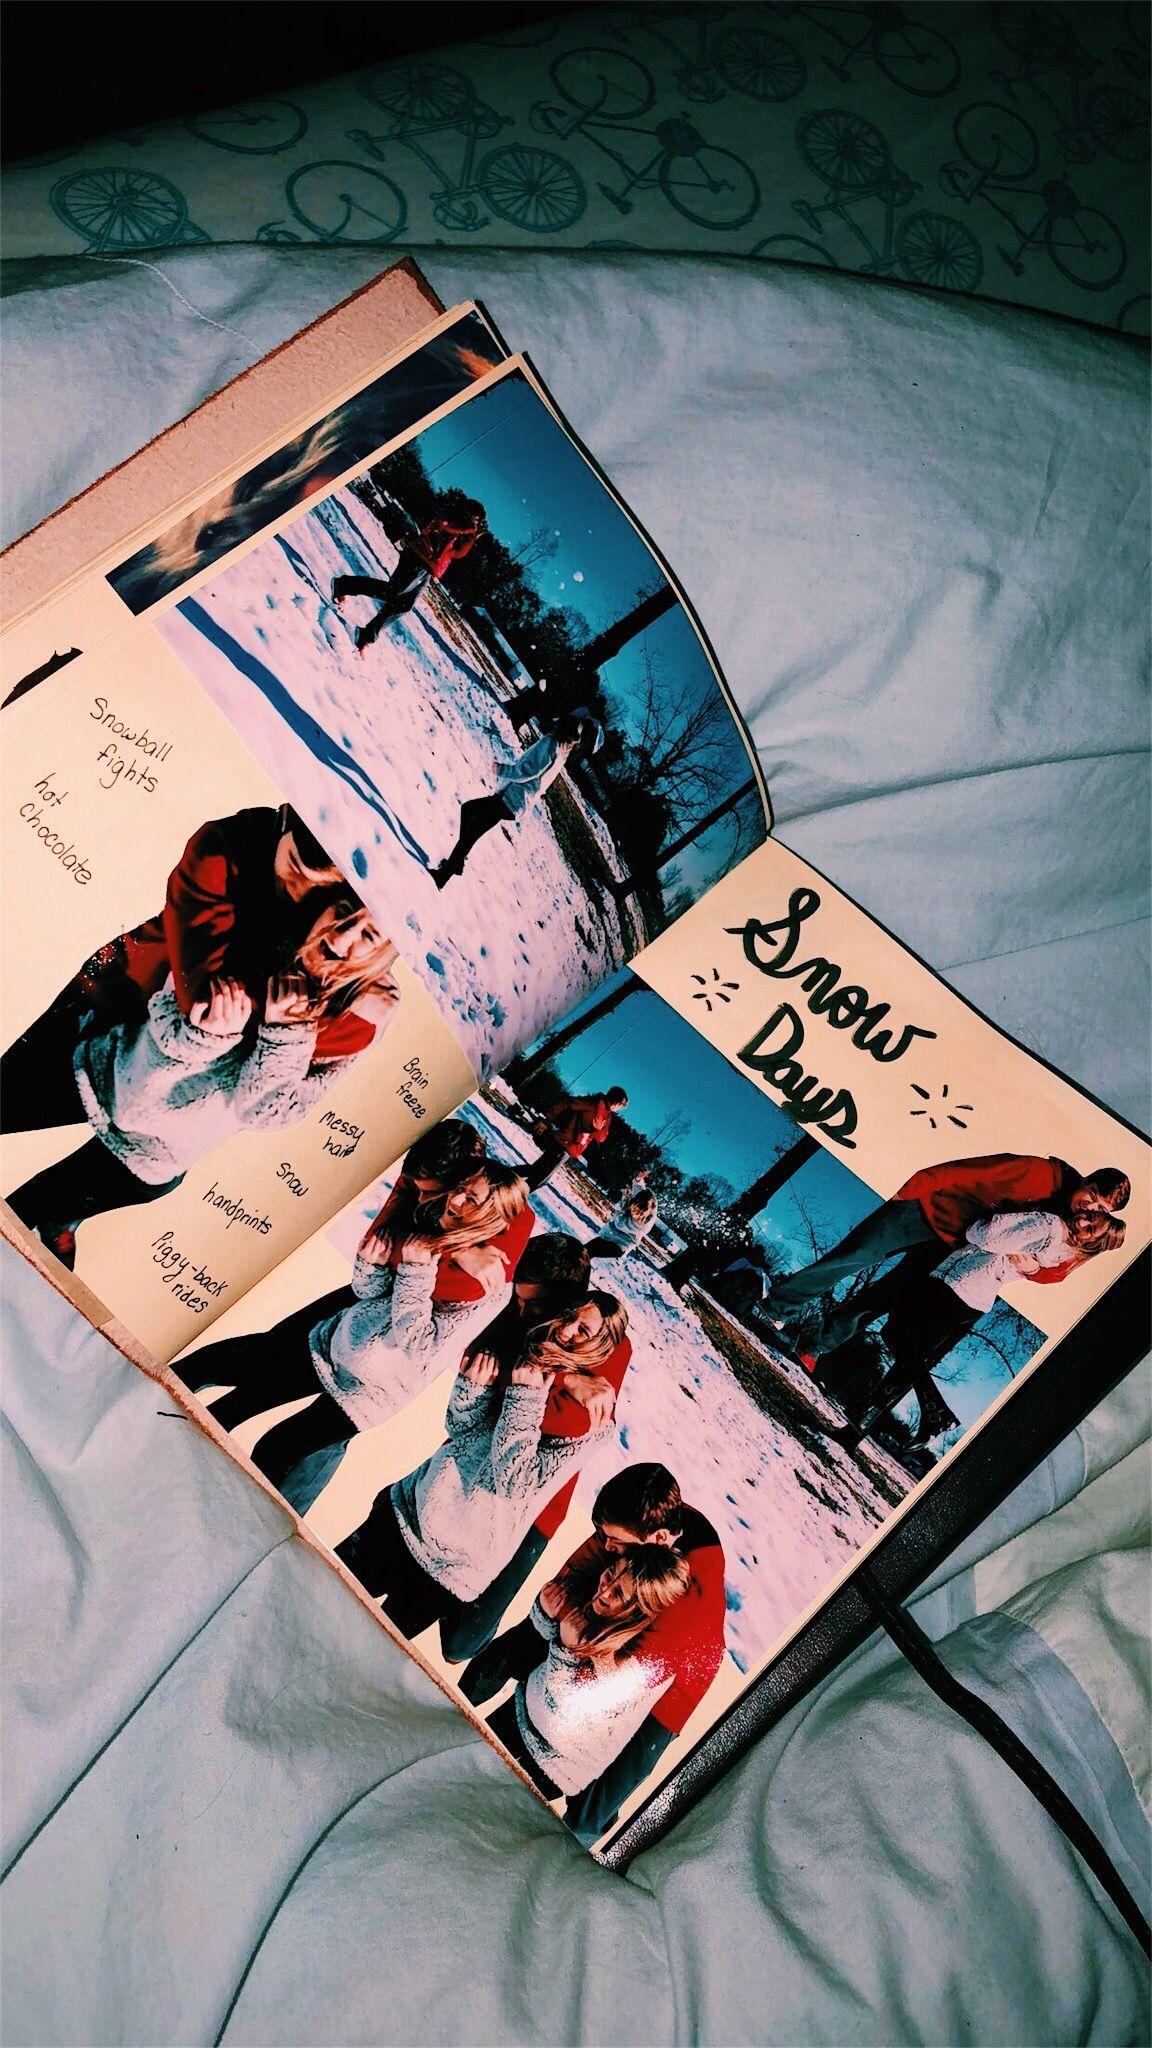 𝚙𝚒𝚗𝚝𝚎𝚛𝚎𝚜𝚝 Laneyschof Friend Scrapbook Diy Gifts